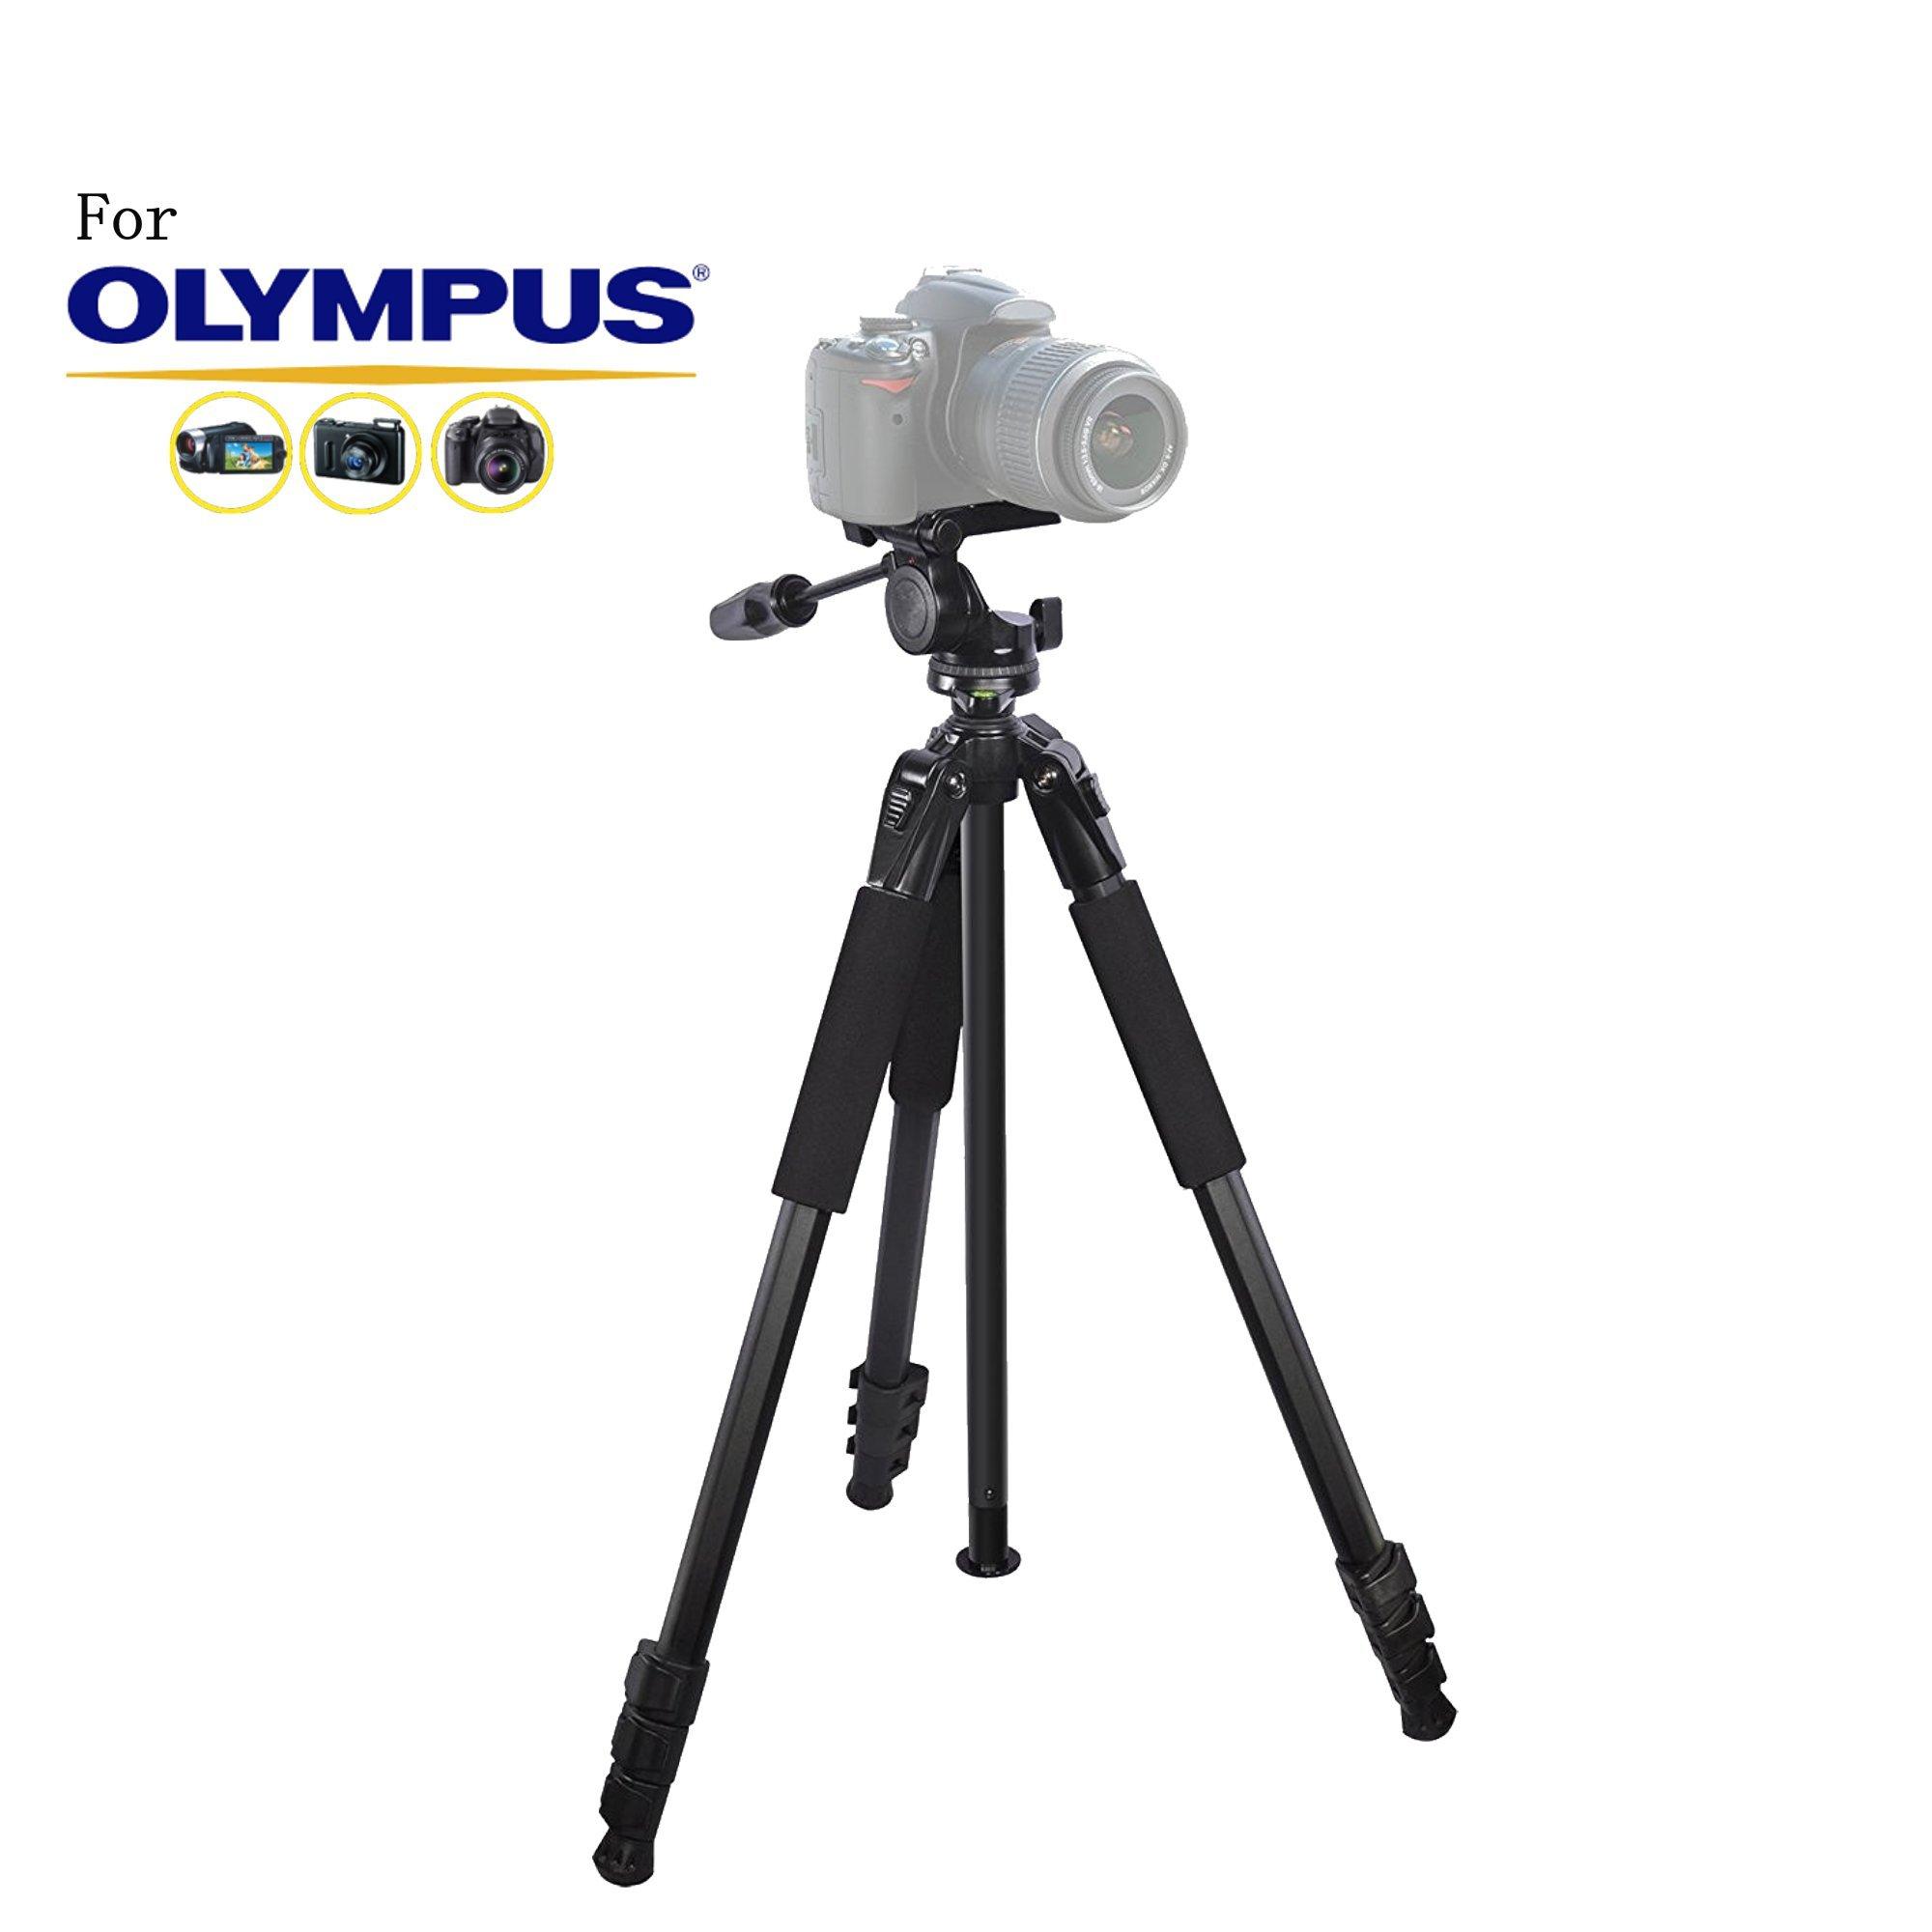 80 inch Heavy Duty Portable tripod for Olympus E-620, OM-D E-M1, OM-D E-M10, OM-D E-M10 II, OM-D E-M5, OM-D E-M5 II, SP-350 Cameras: Travel tripod by iSnapPhoto